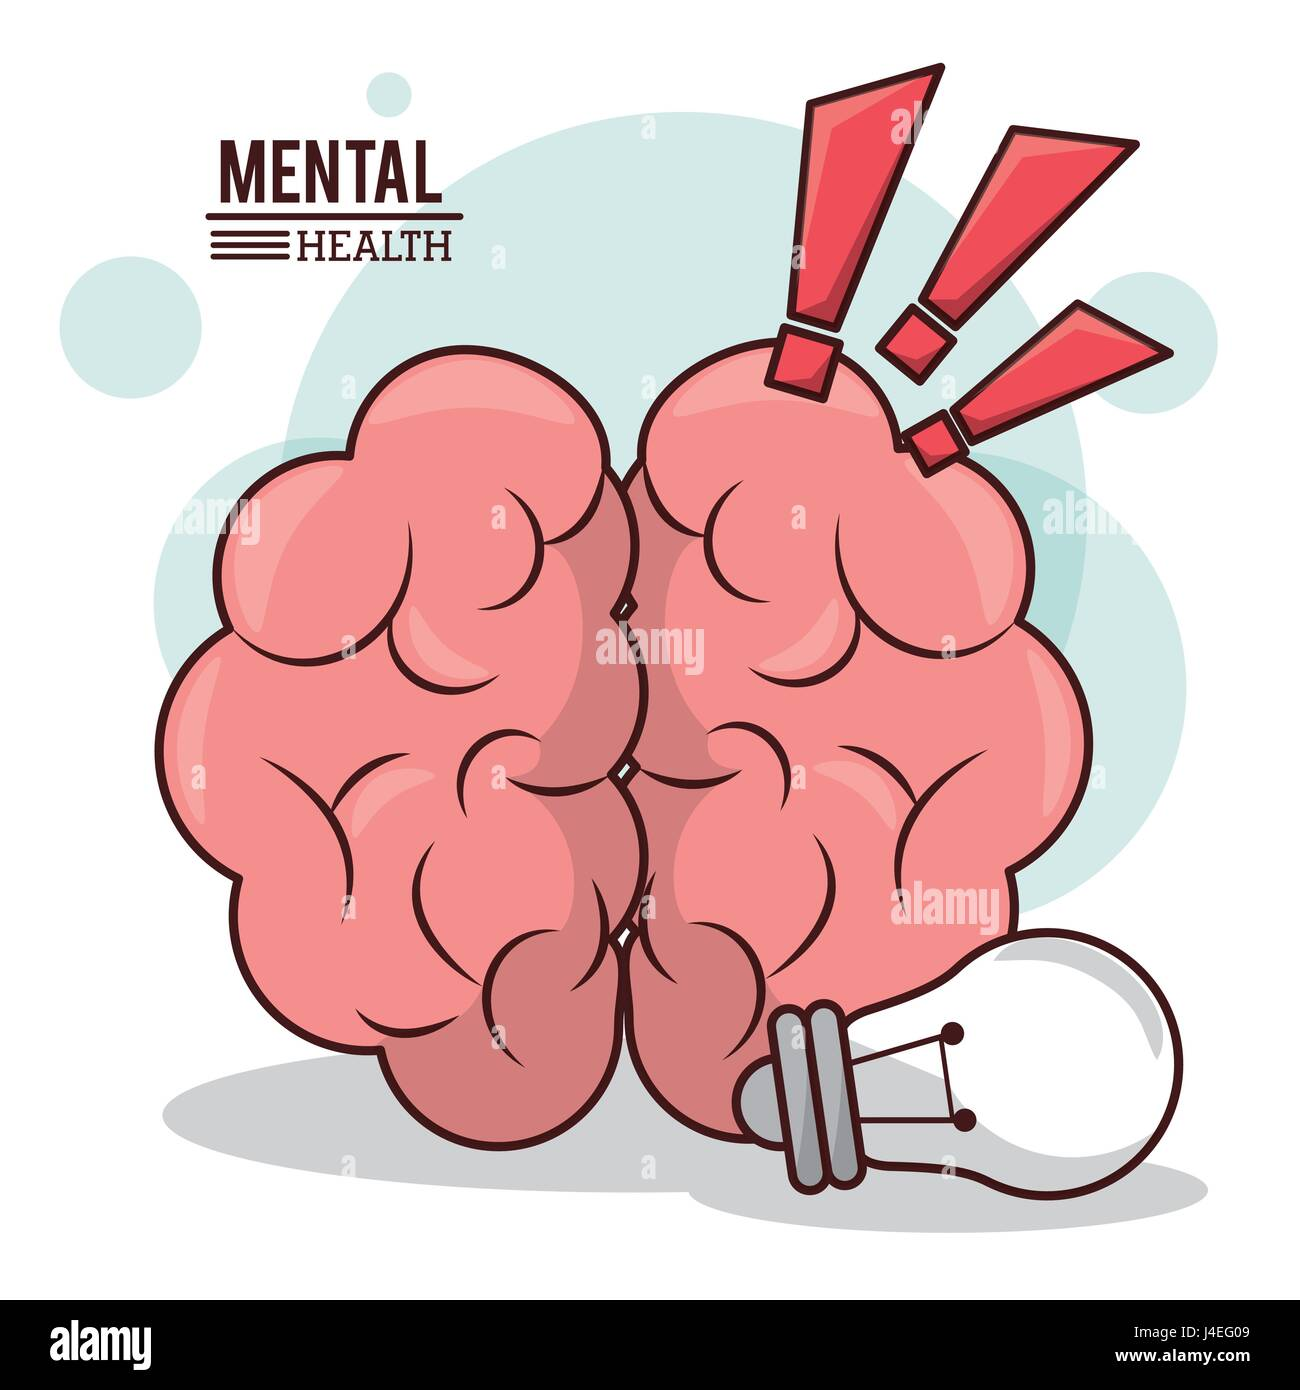 mental health, human brain idea exclamation mark design Stock Vector